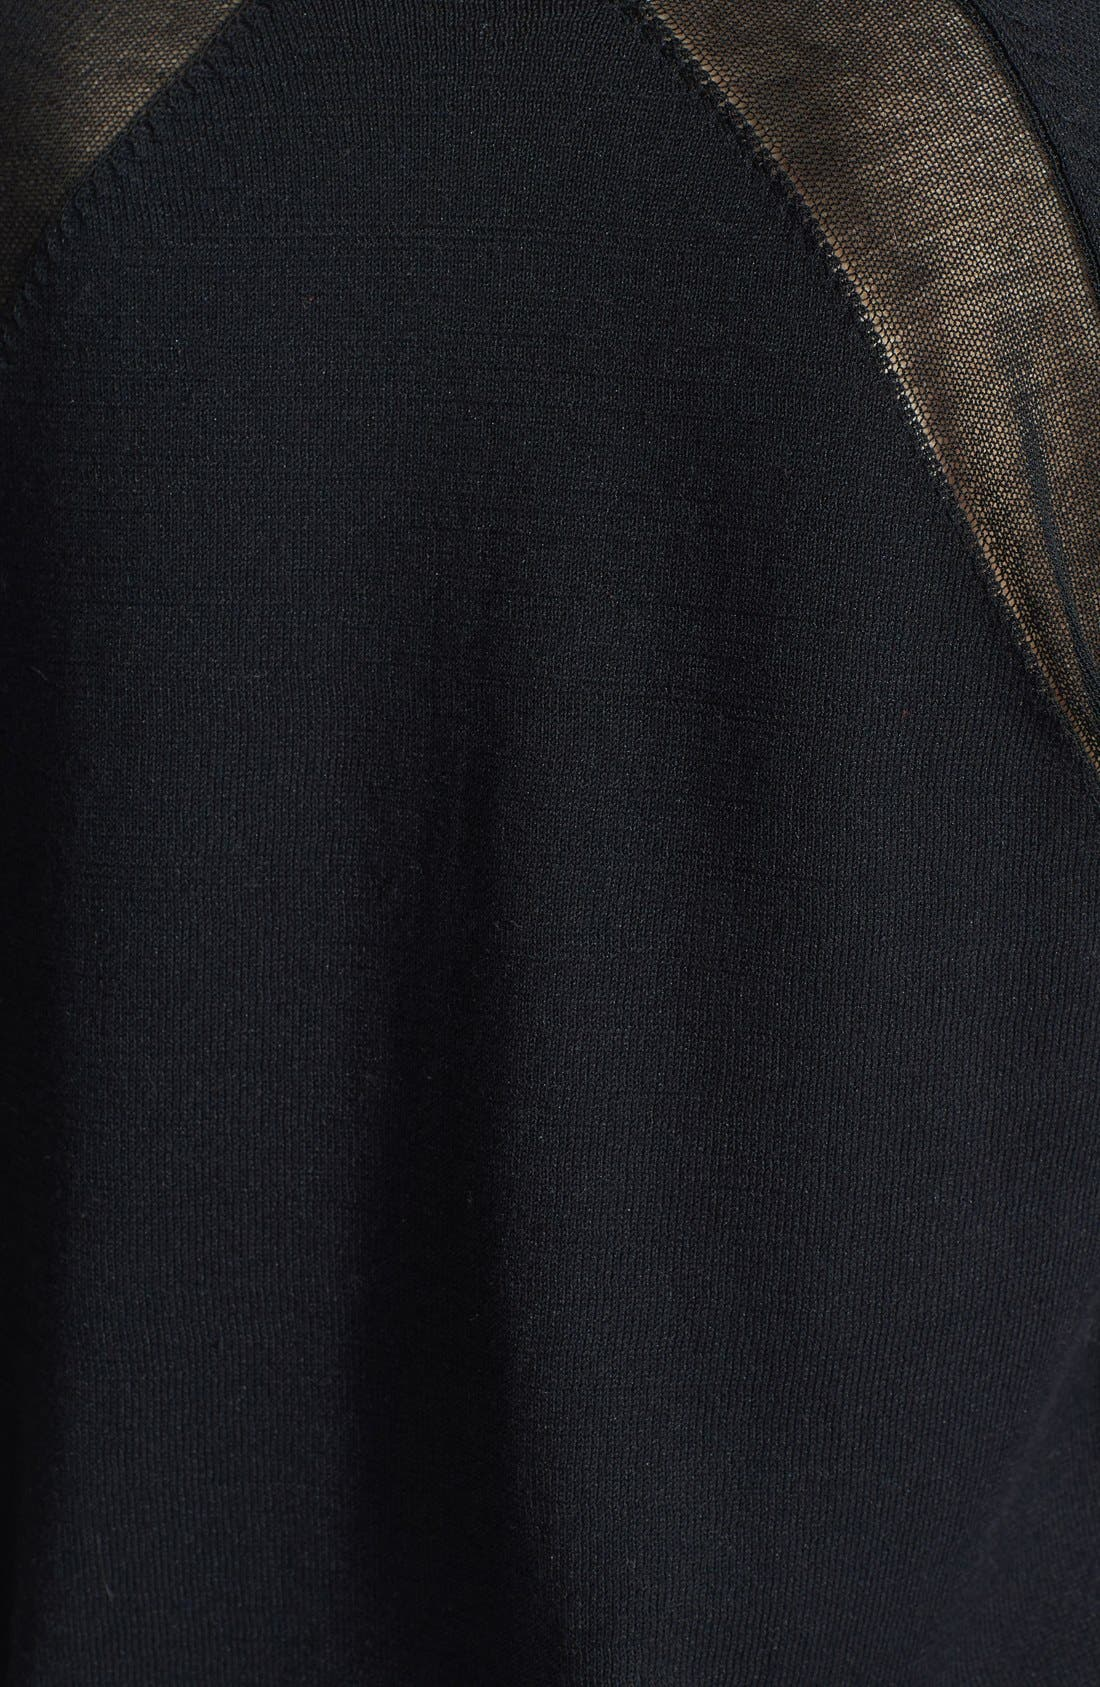 HALOGEN<SUP>®</SUP>, Semi-Sheer Inset Sweater, Alternate thumbnail 2, color, 001